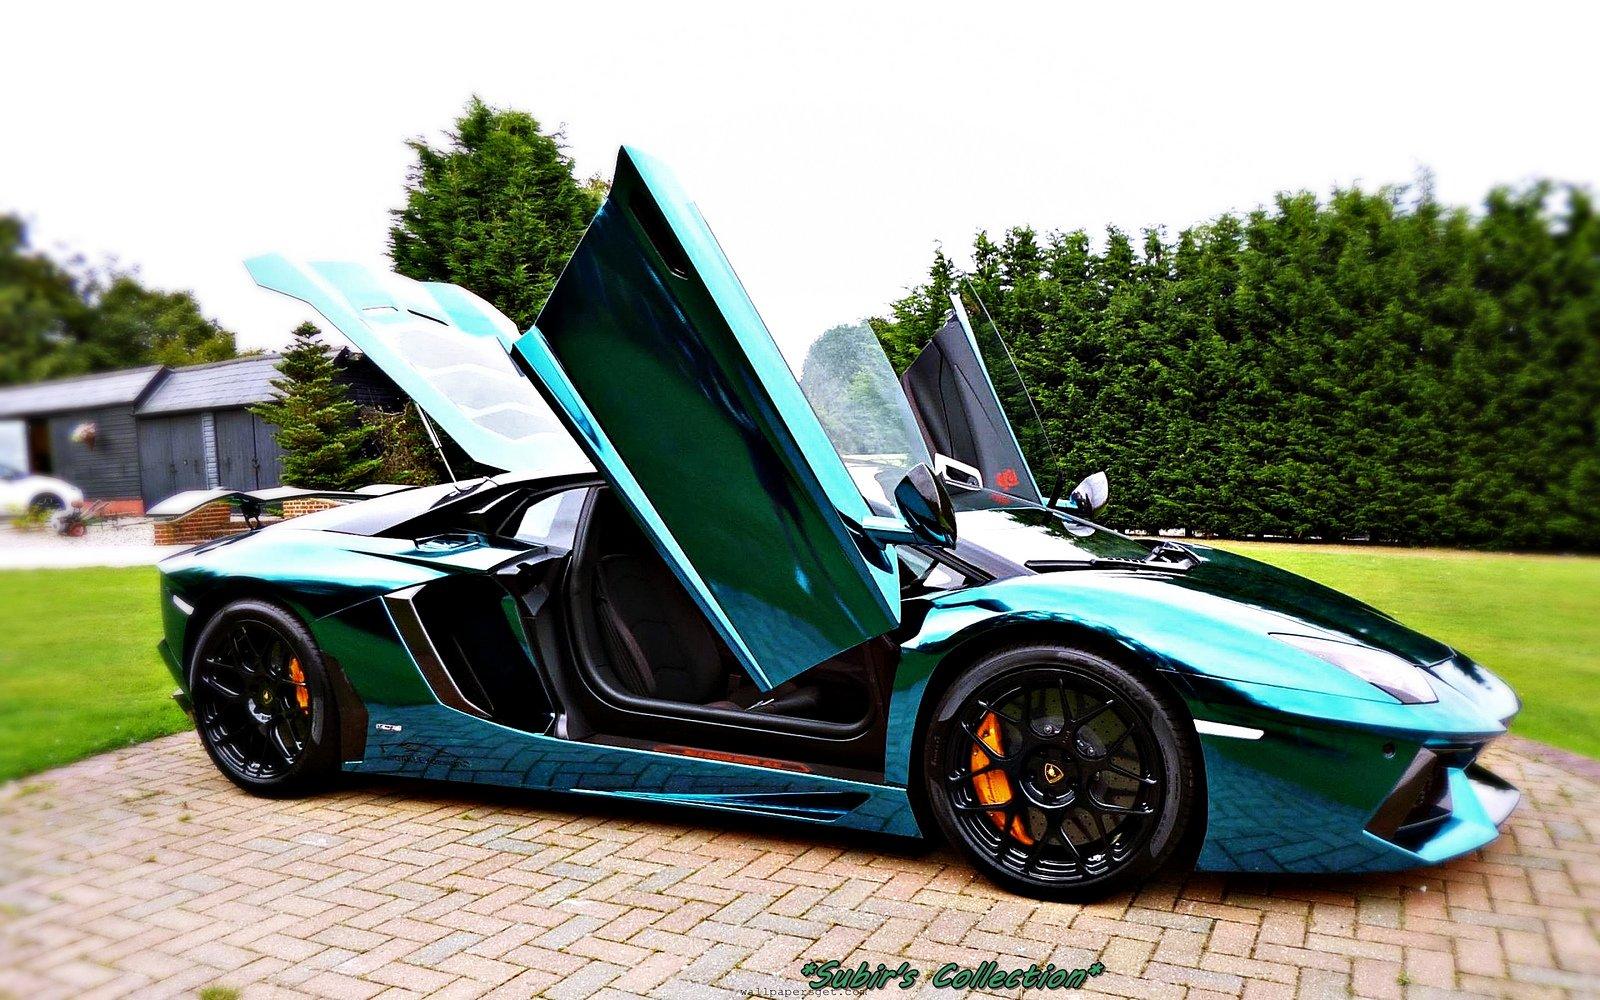 aventador lamborghini lp700 supercars tuning blue chrome wrapping wallpaper 1600x1000 393756 wallpaperup - Lamborghini Aventador Blue Chrome